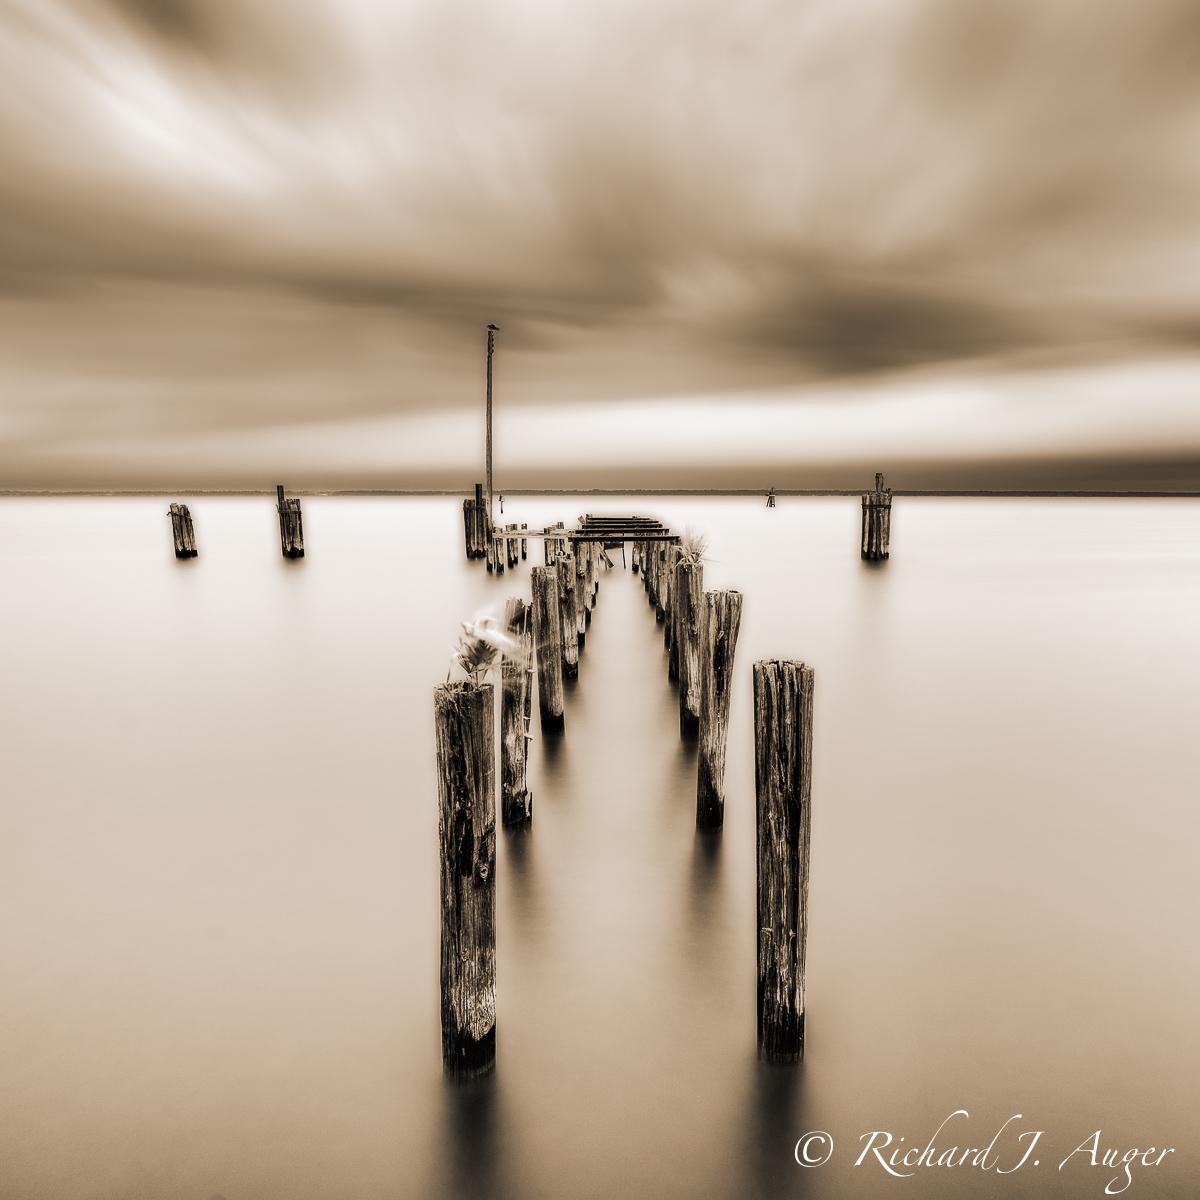 Lake Monroe, St Johns River, Historic Sandford Florida, lake, water, long exposure, photographer, photograph, pylons, dock, historic, square, sepia tone